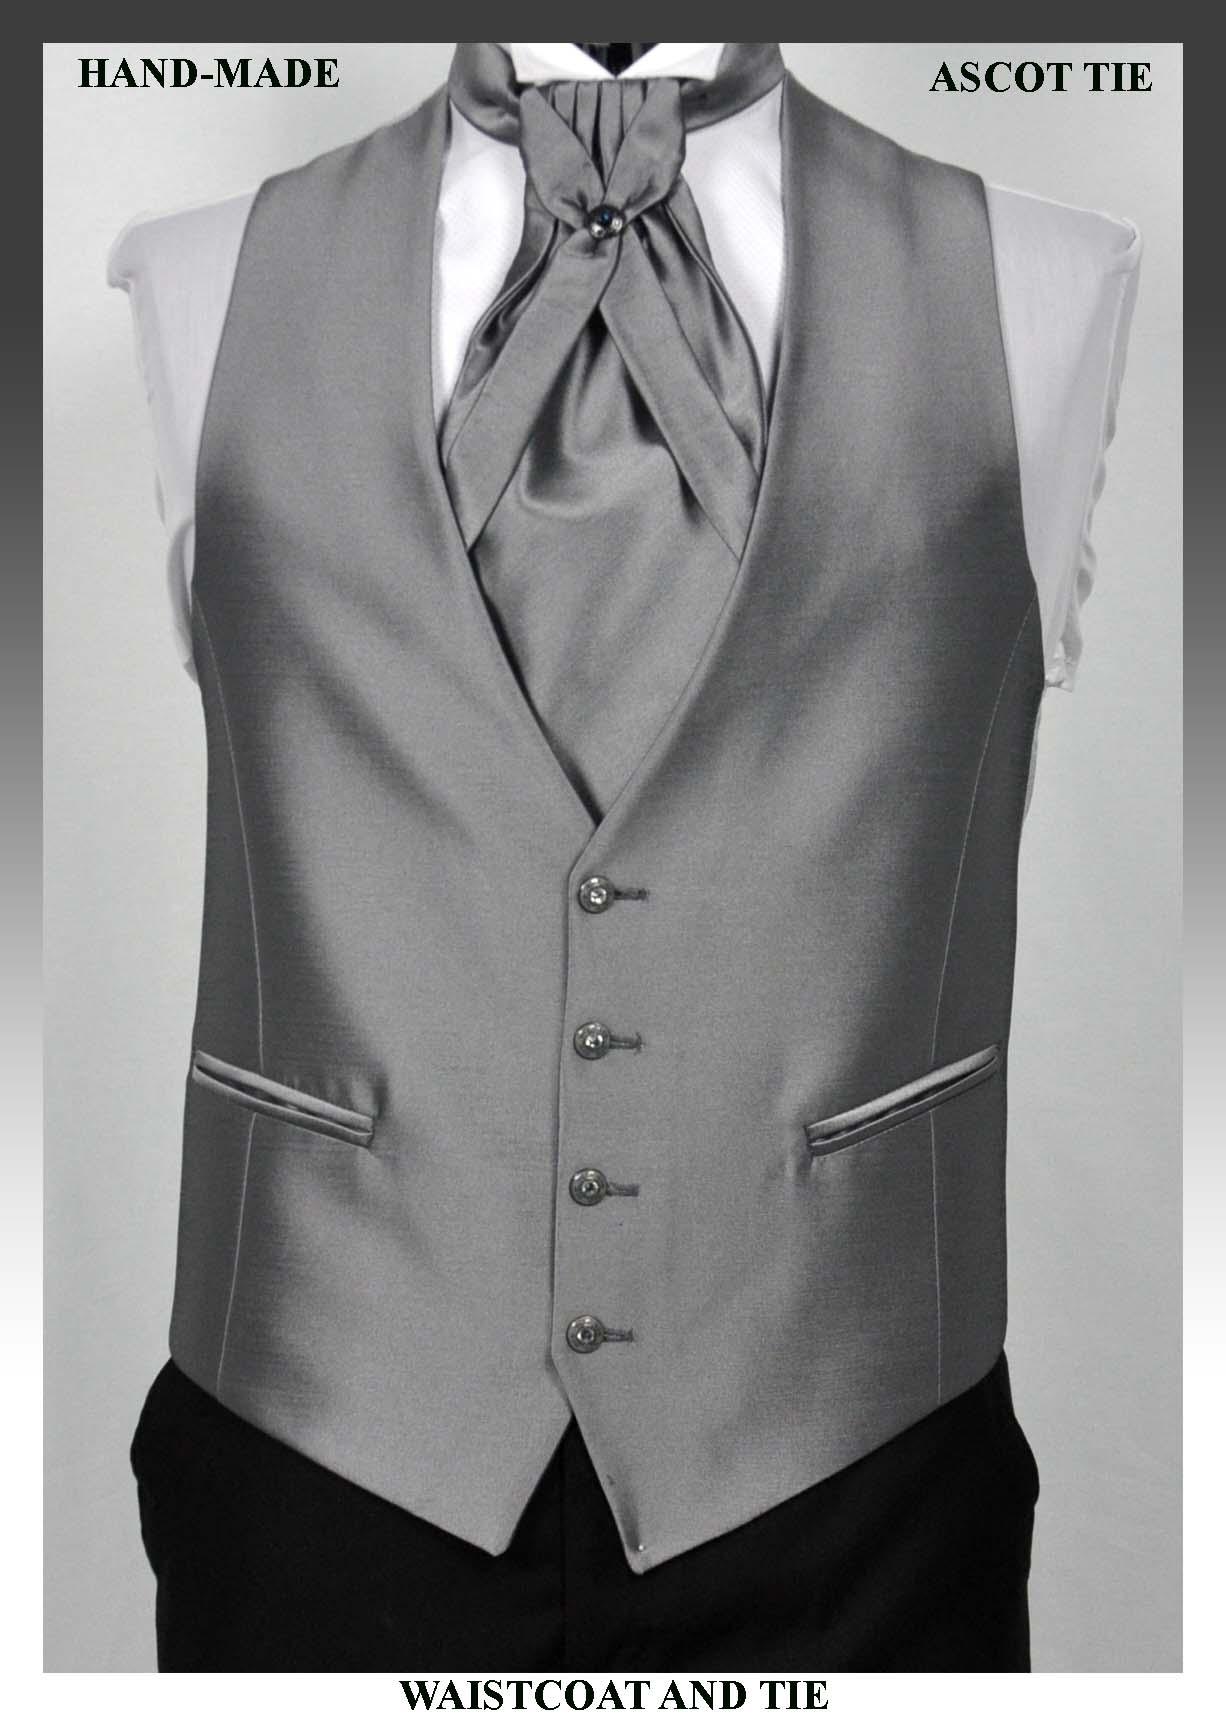 dd981b823e Western Men Wedding Accessories - Tuxedo Accessories